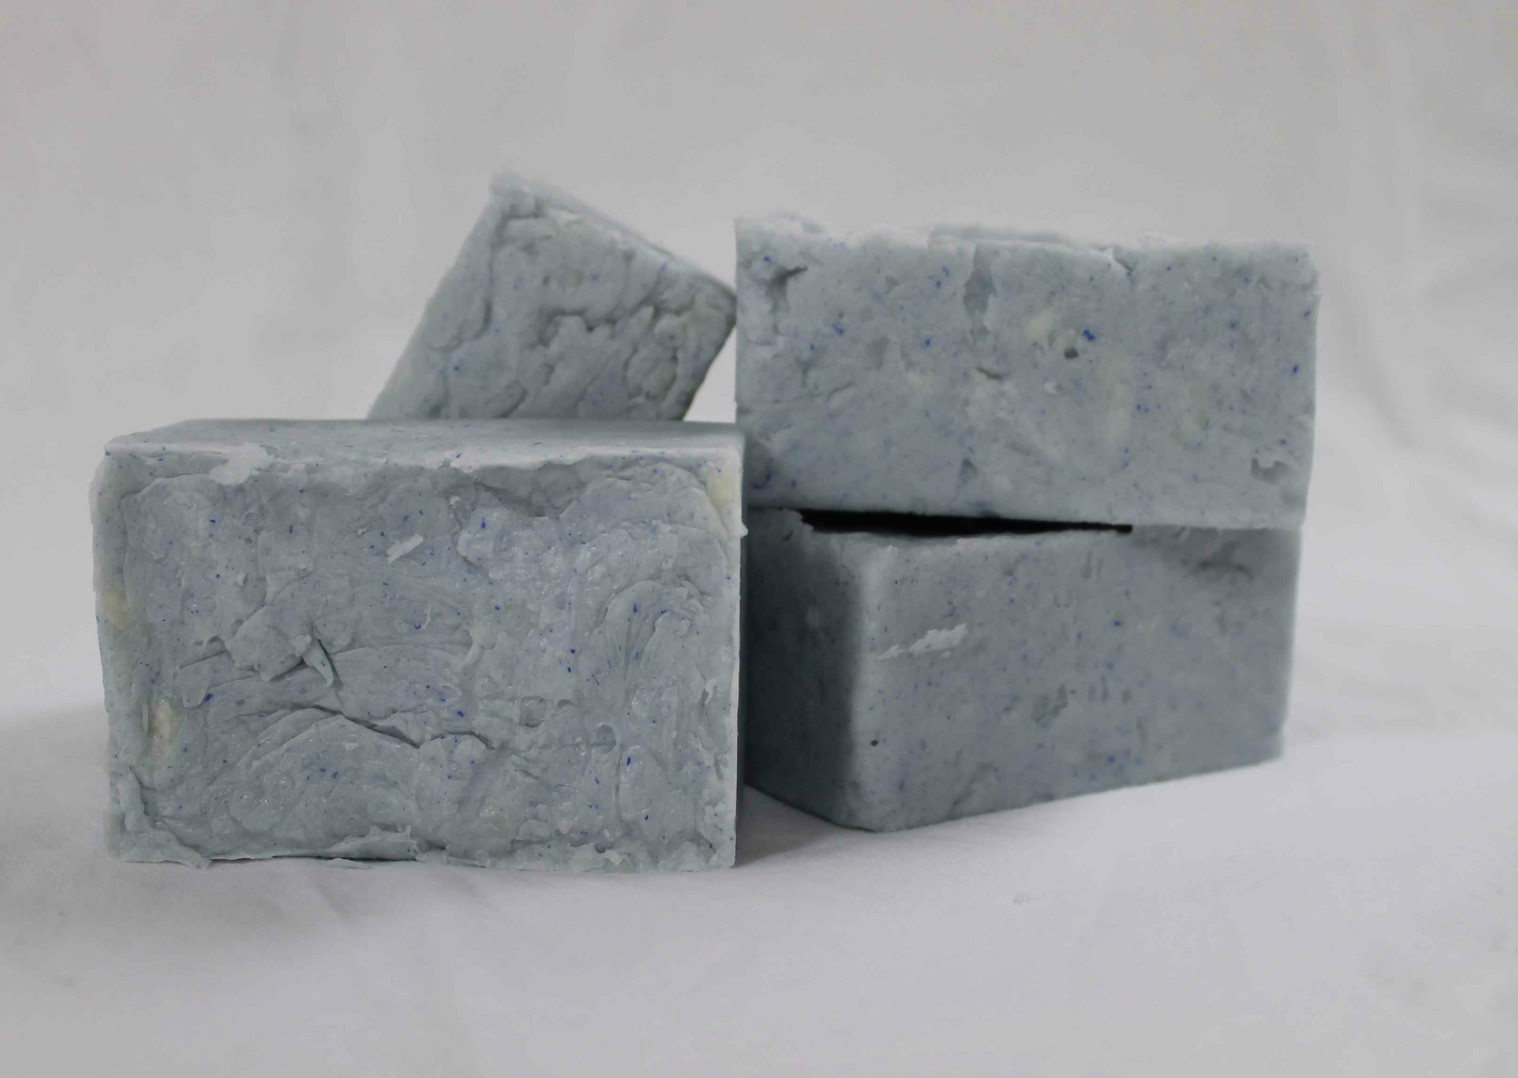 Heather-and-Hyacinth-soap.jpg